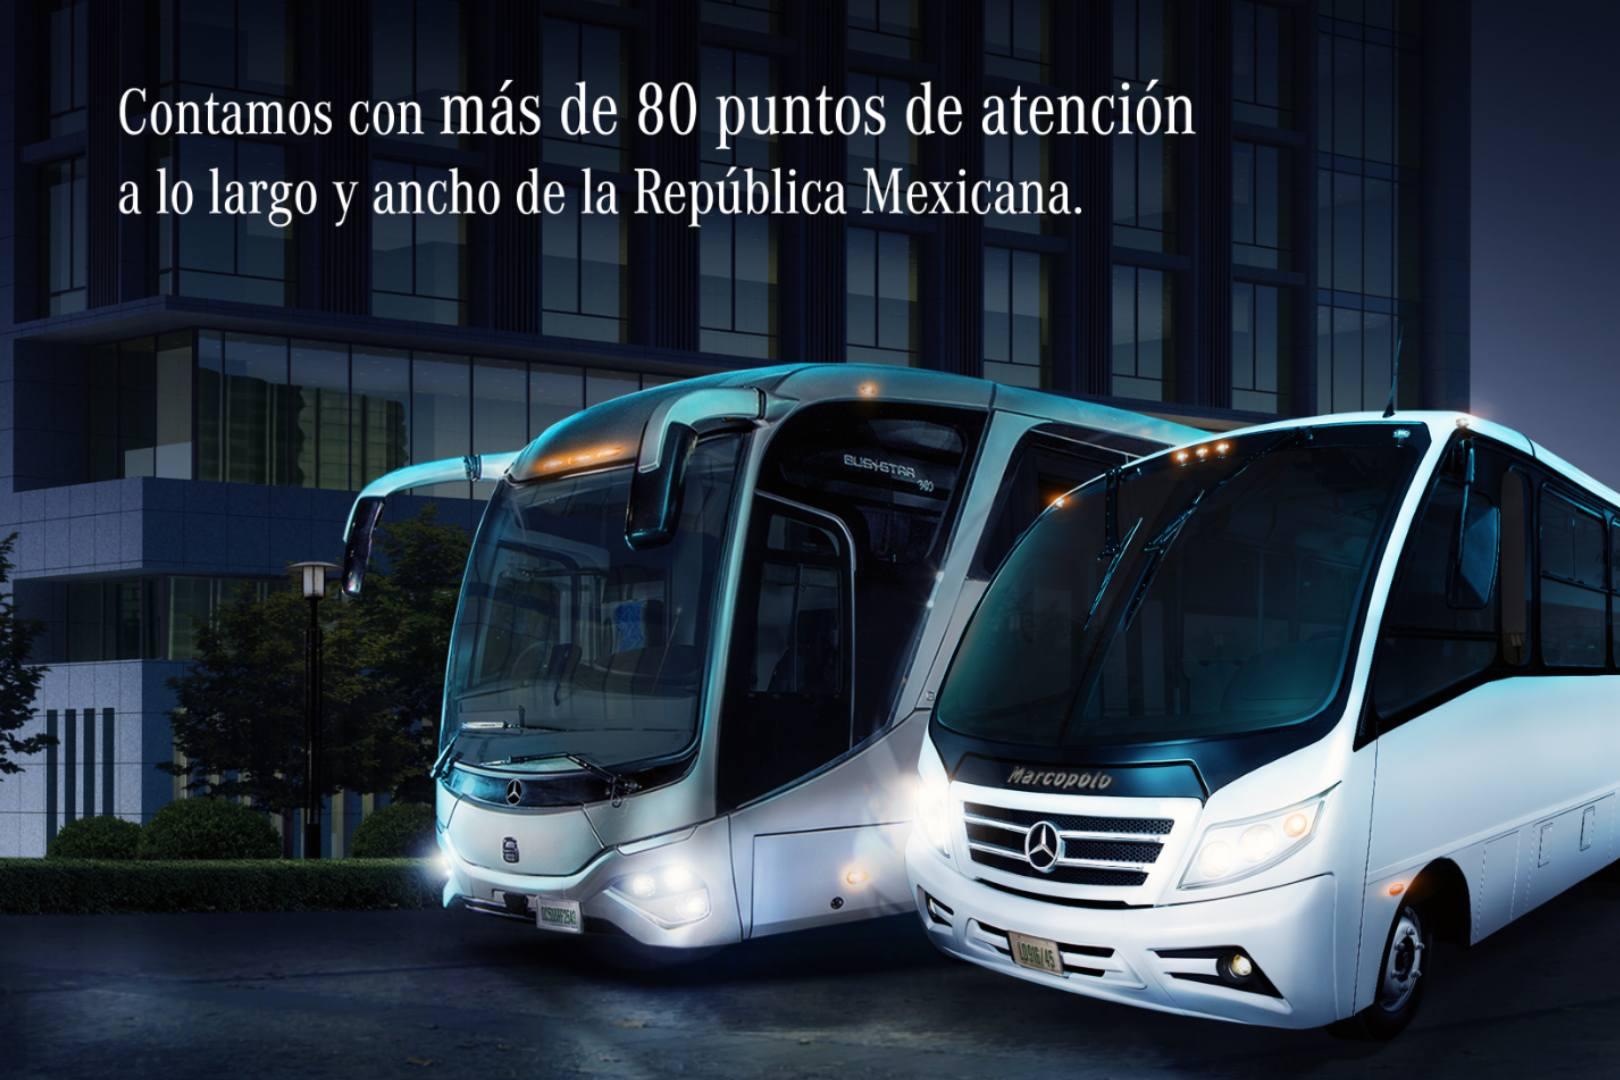 Mercedes-Benz Autobuses, Postventa, Refacciones,